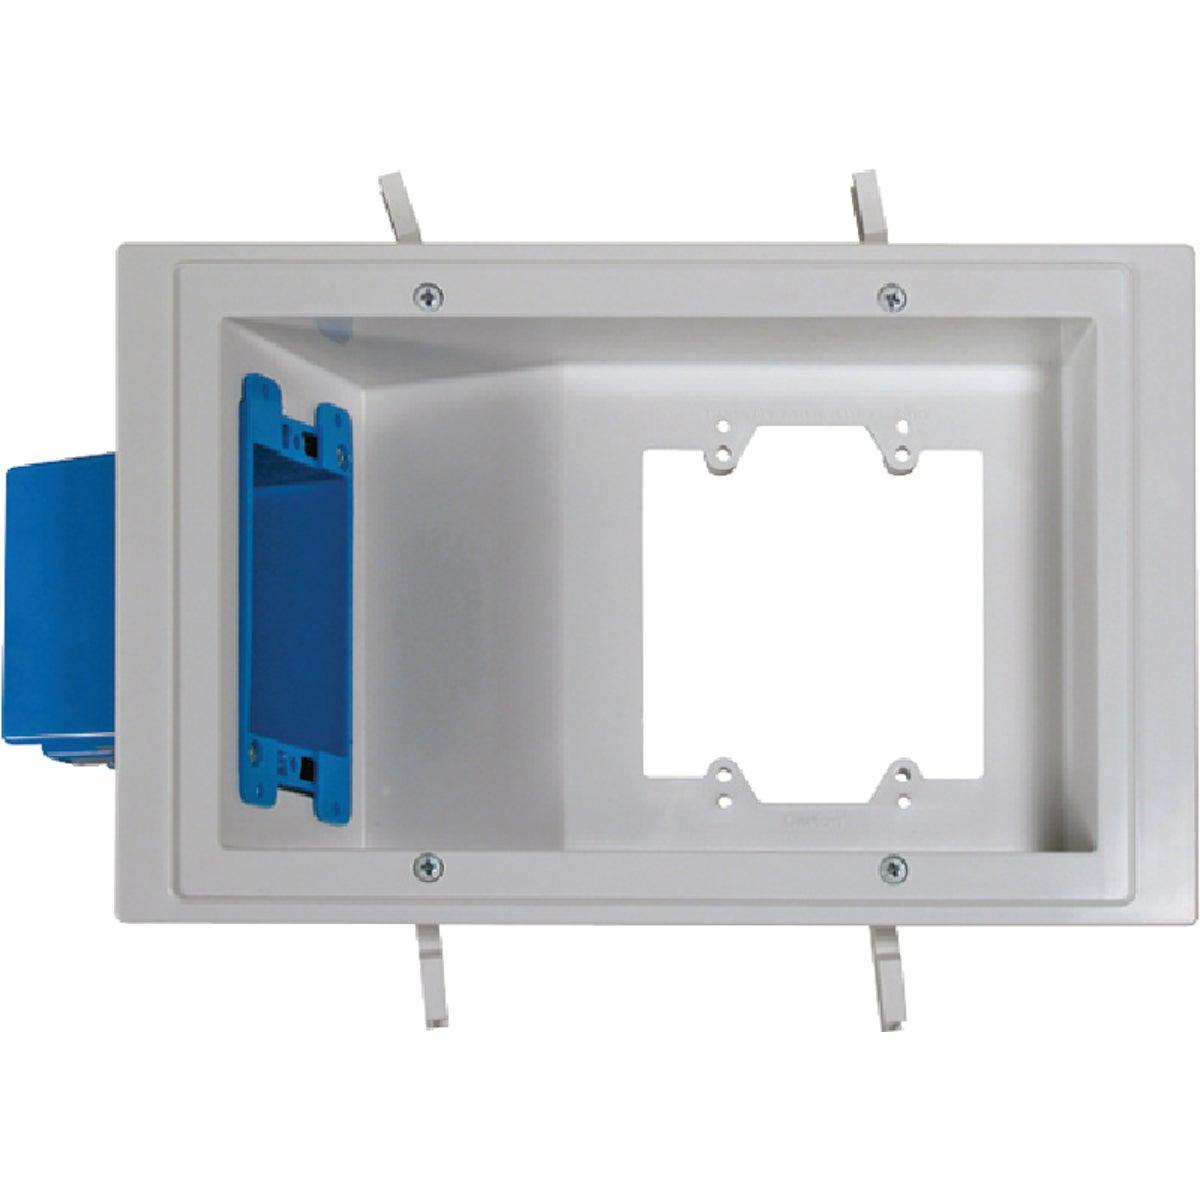 Flat Panel TV Electric Box